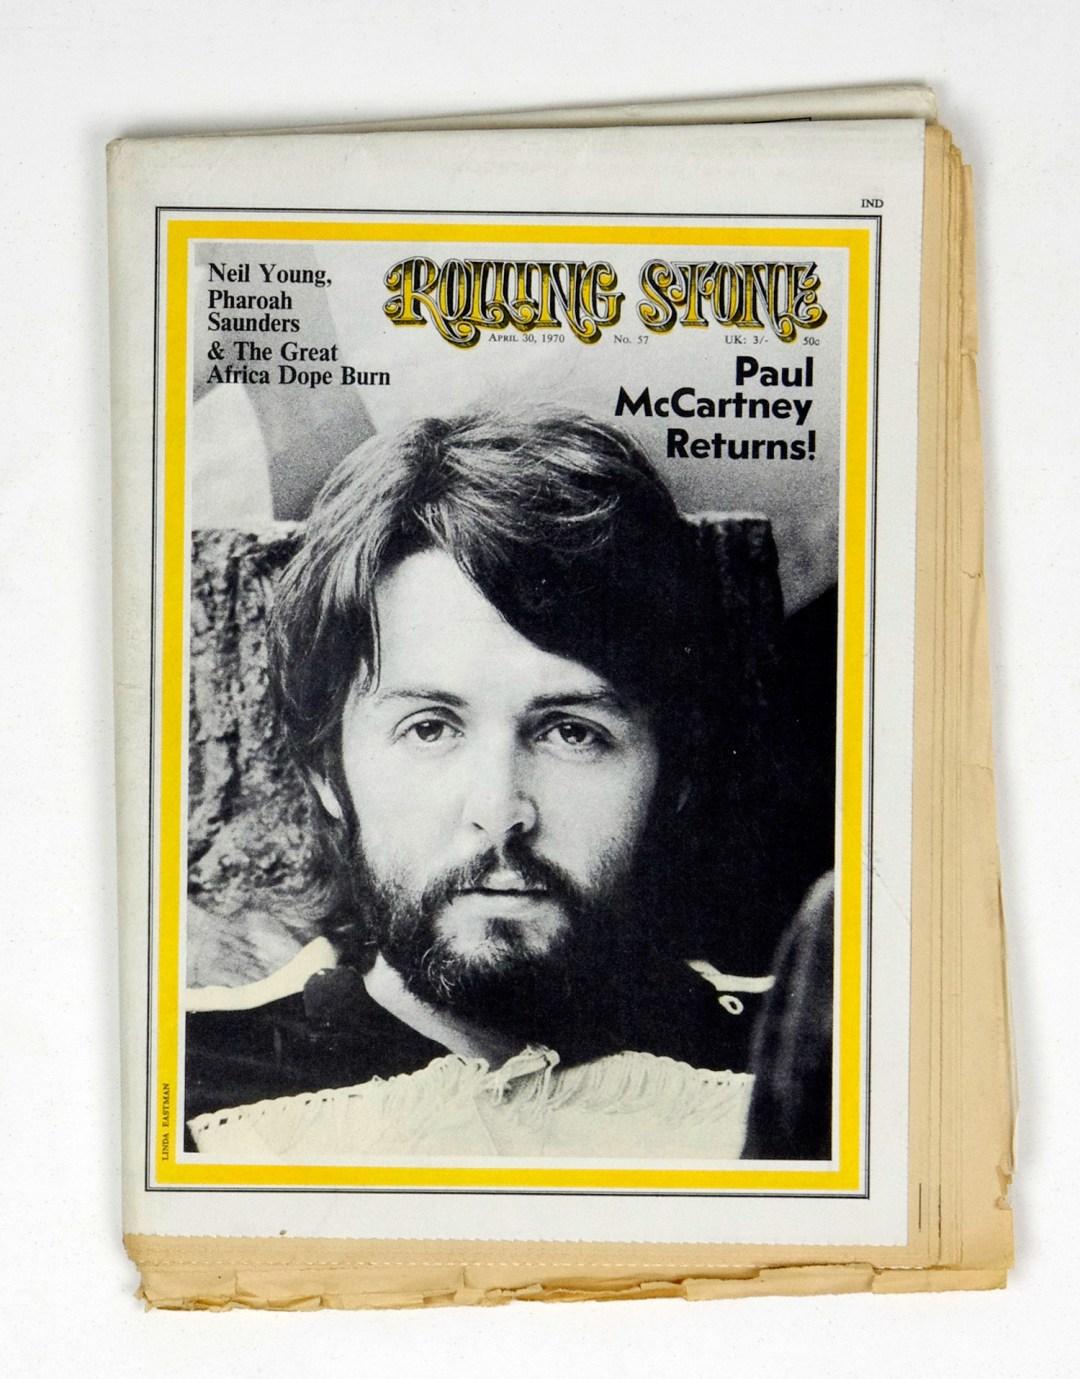 Rolling Stone Magazine 1970 Apr 30 No. 57 Paul McCartney